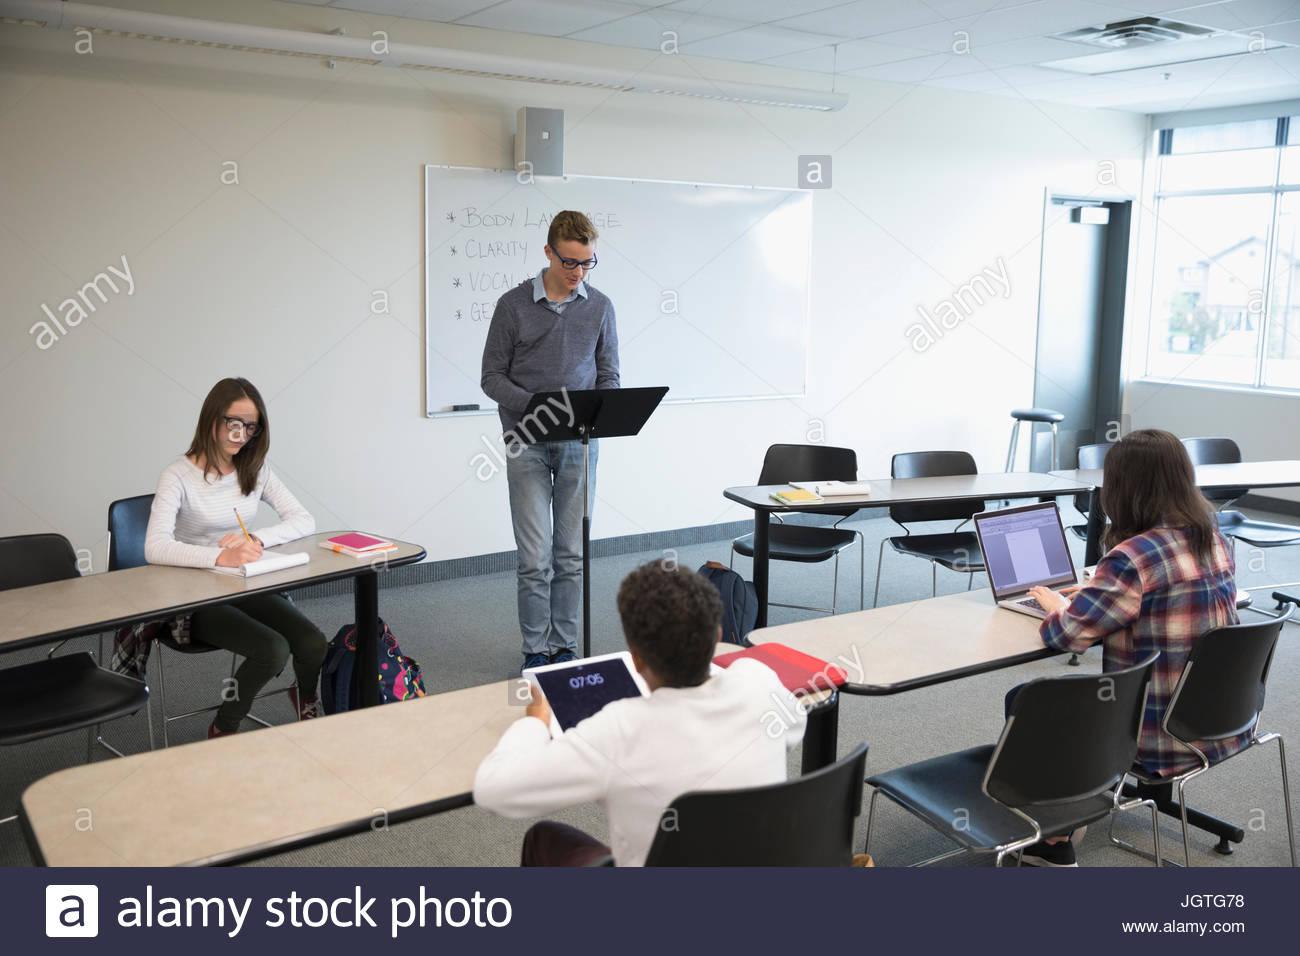 Boy middle school student speaking in debate club in classroom - Stock Image